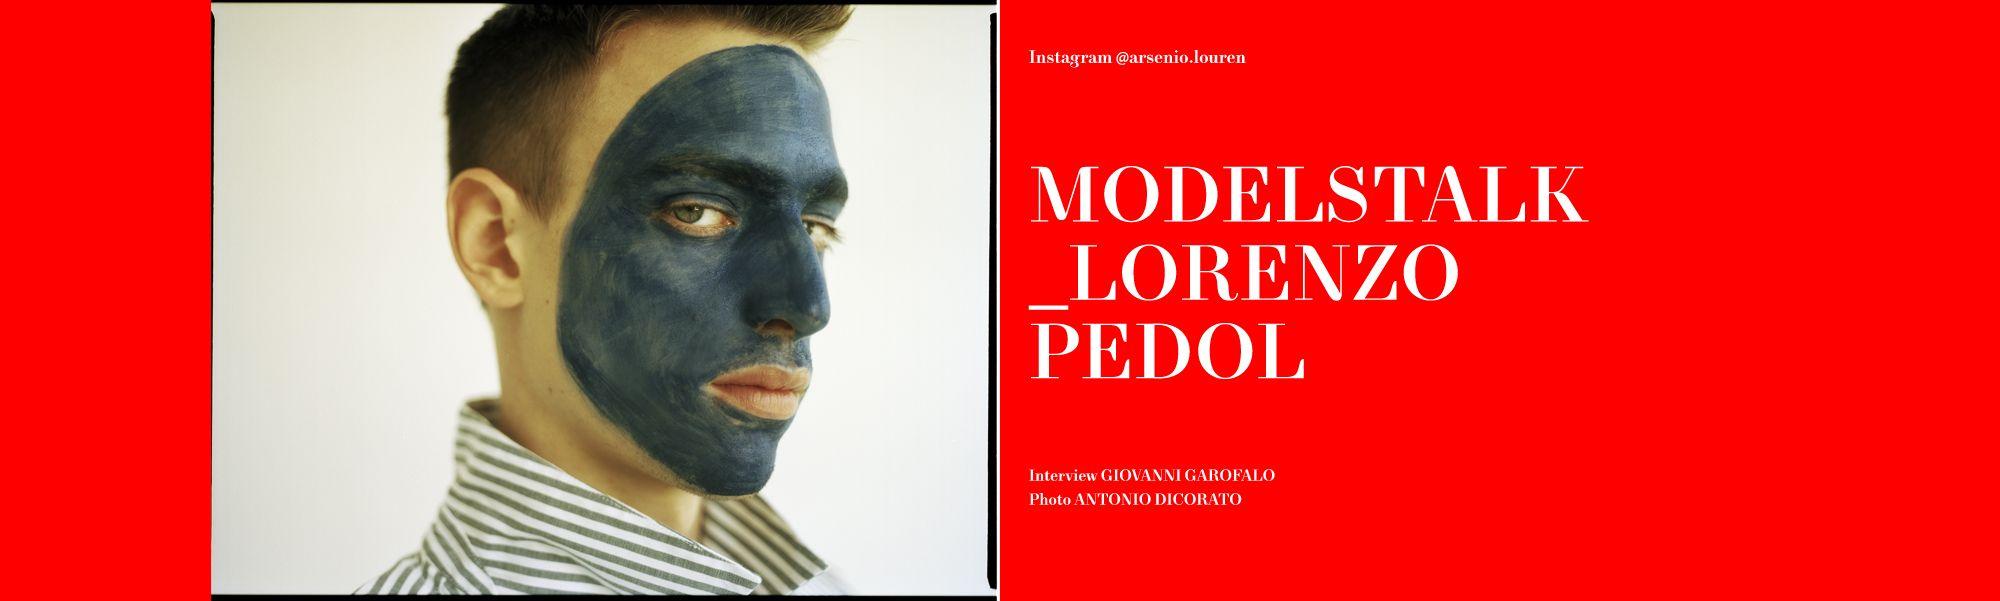 lorenzo-pedol-banner-talking-heads-thegreatestmagazine.jpg